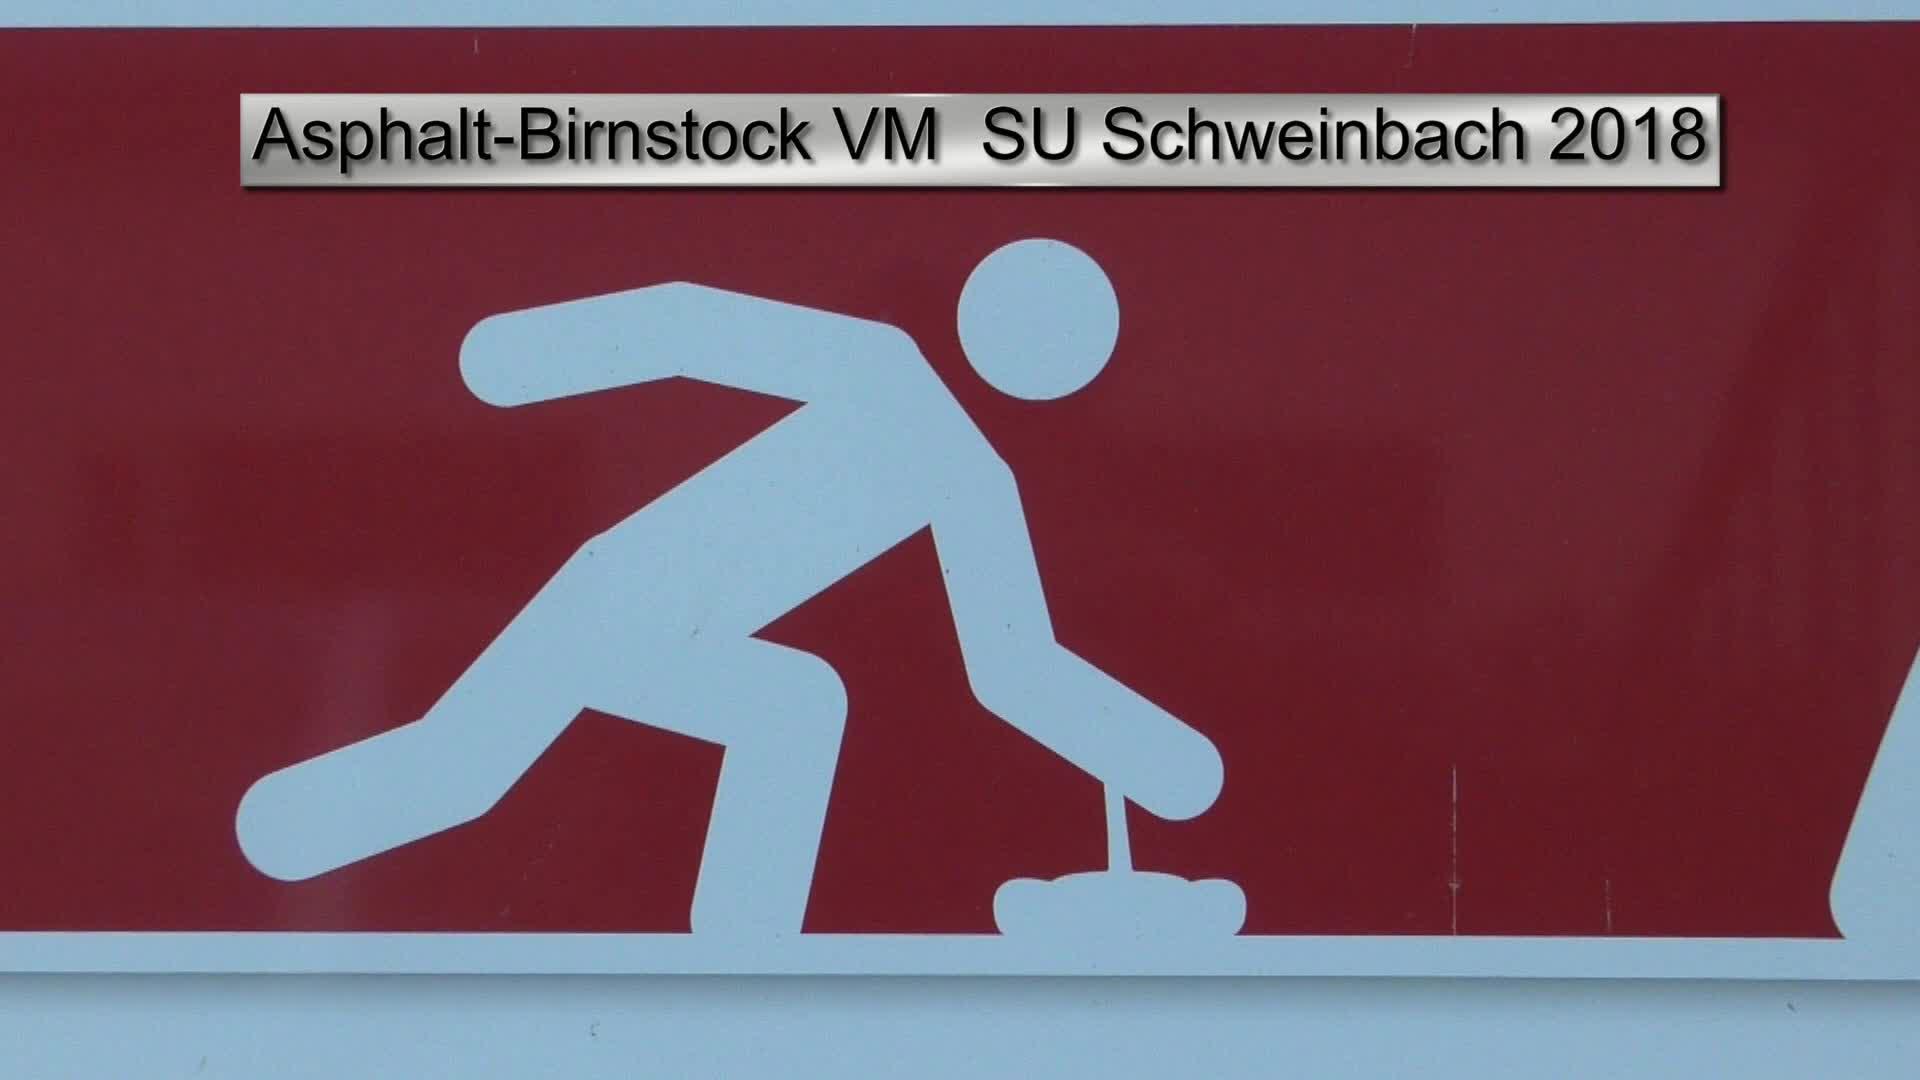 Asphalt-Birnstock VM SU Schweinbach